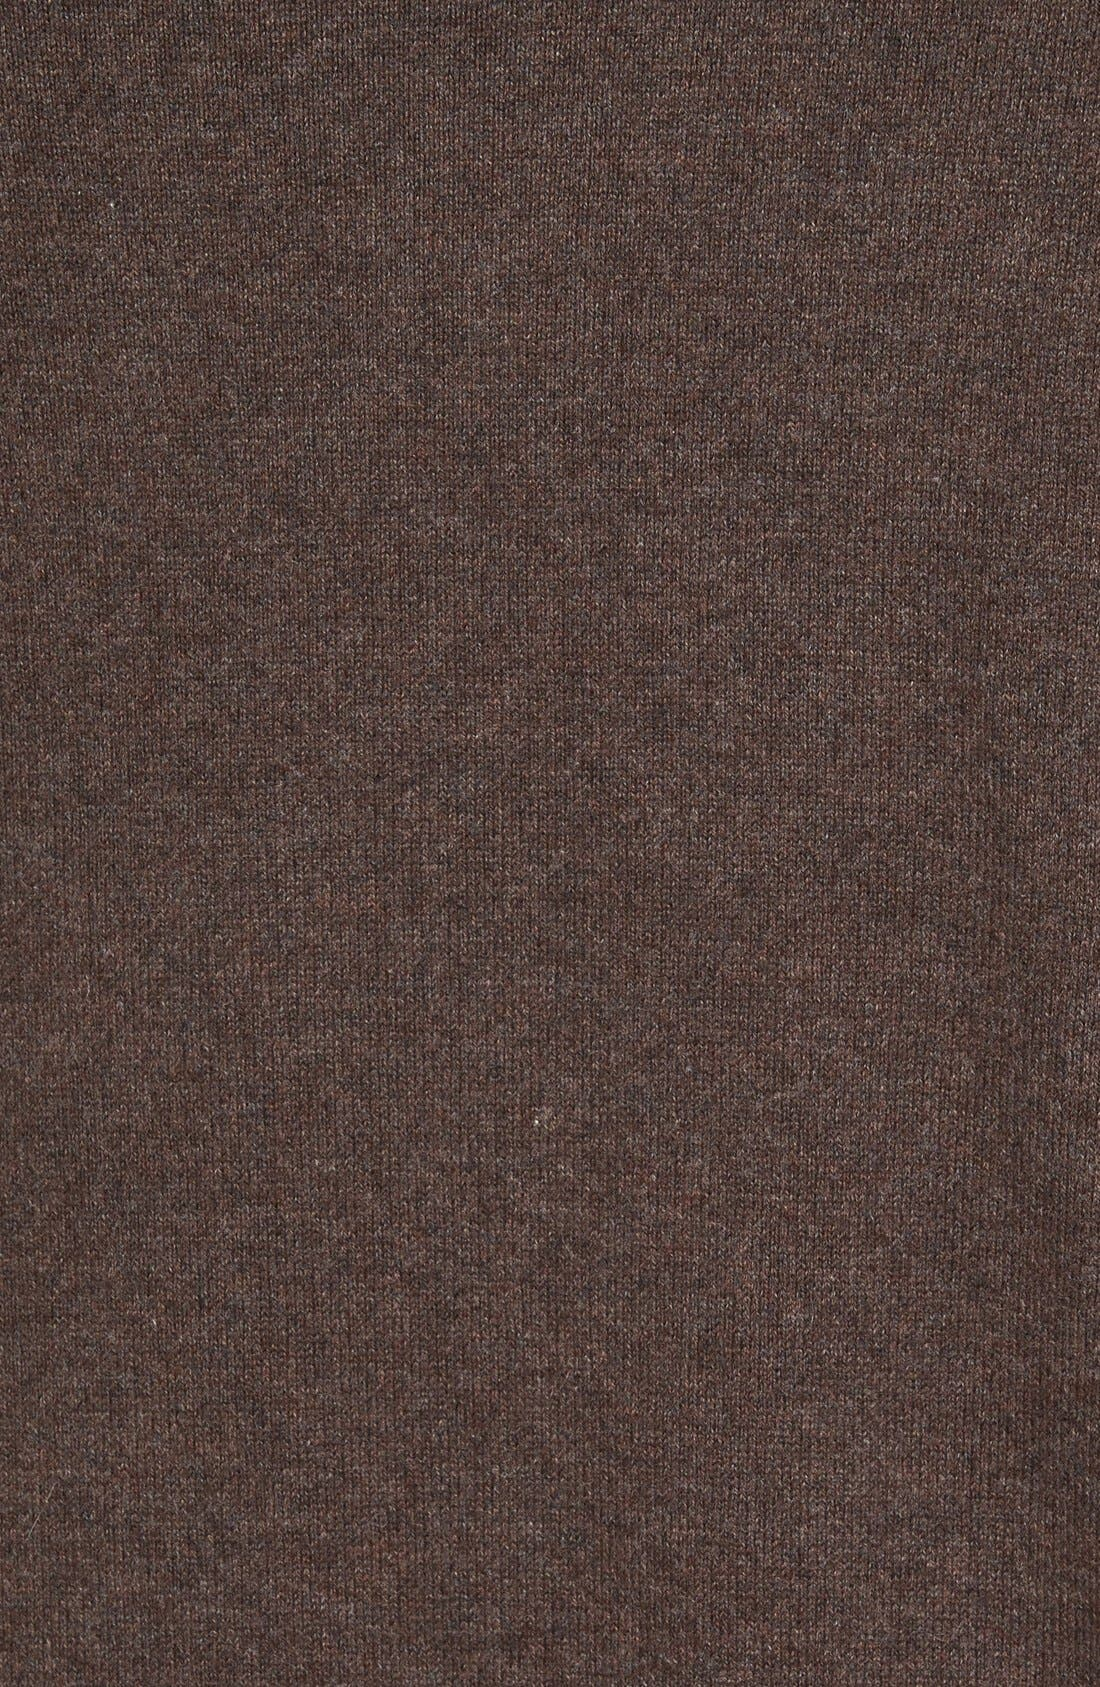 'Jersey Sport' Cotton Blend Crewneck Sweater,                             Alternate thumbnail 35, color,